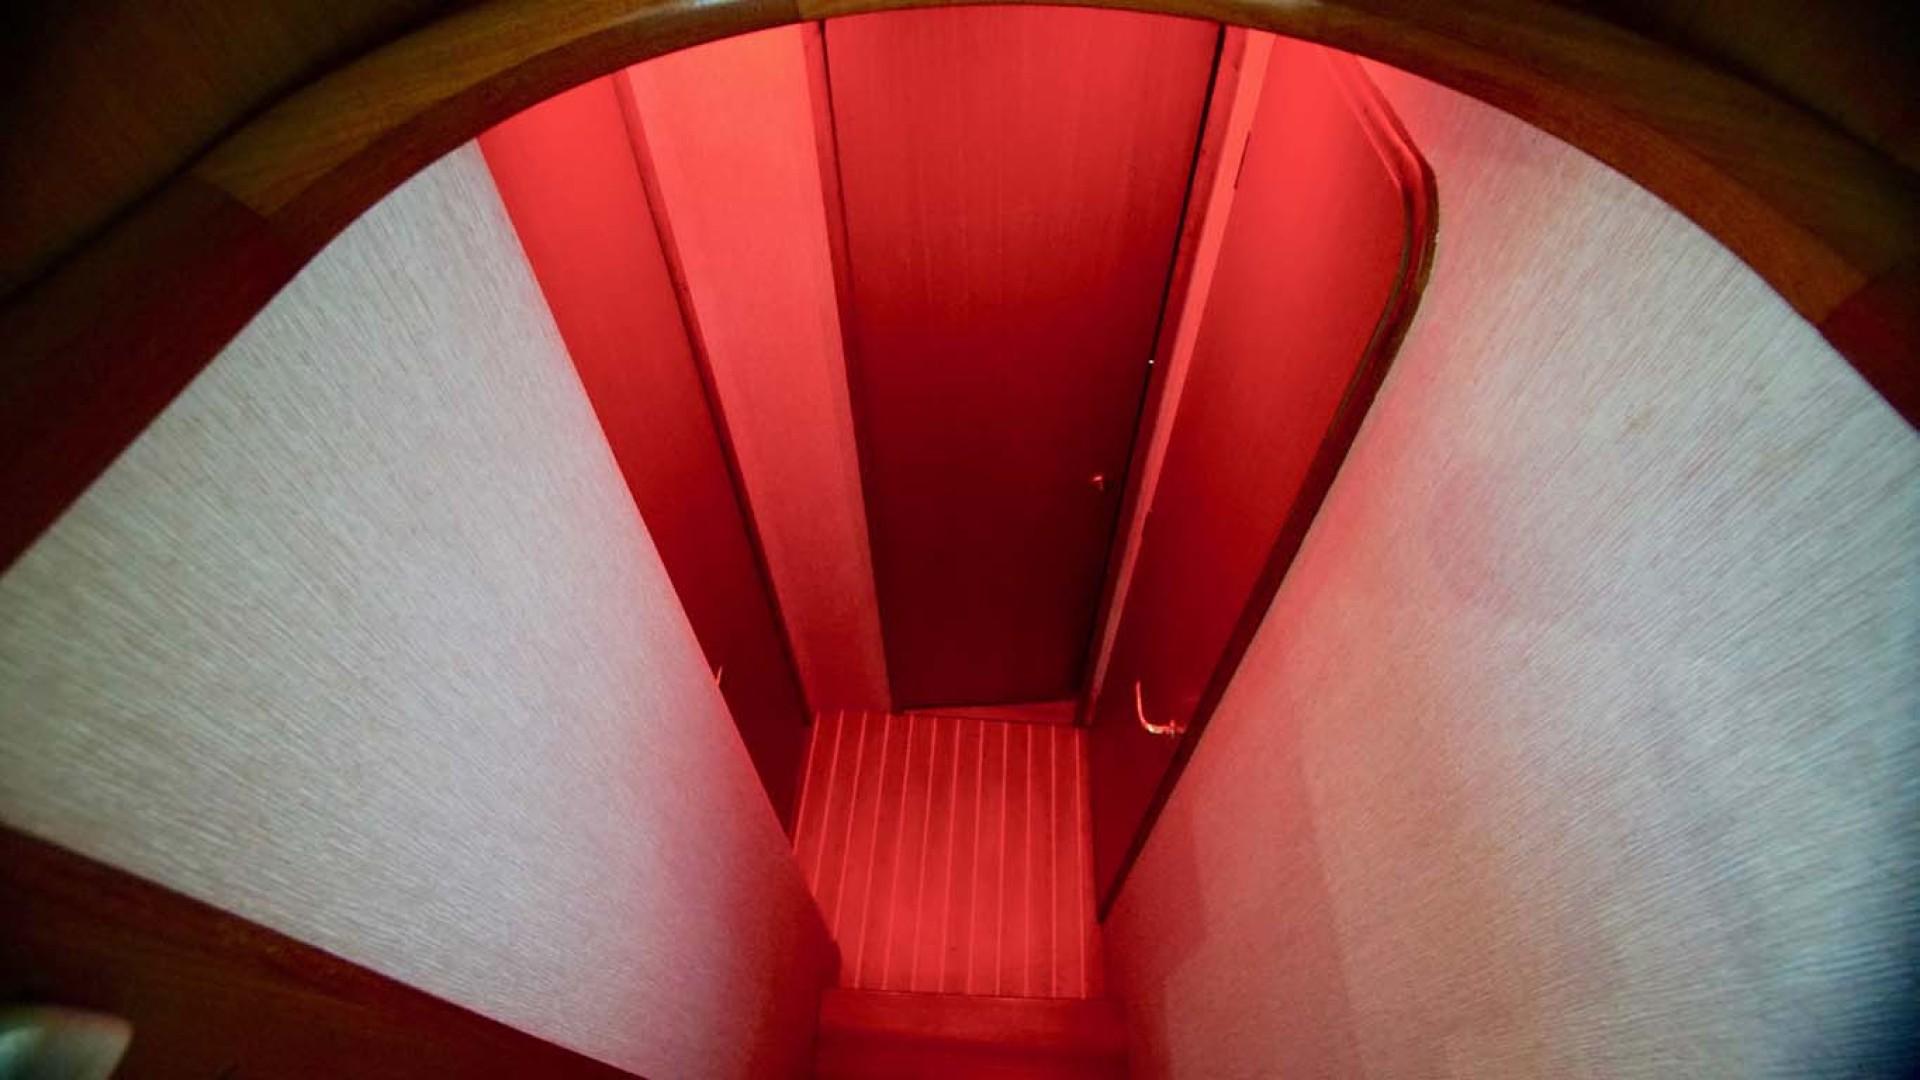 Ocean Yachts-43 Super Sport 2002-Desperado Orange Beach-Alabama-United States-Companionway Red LED-1219864 | Thumbnail